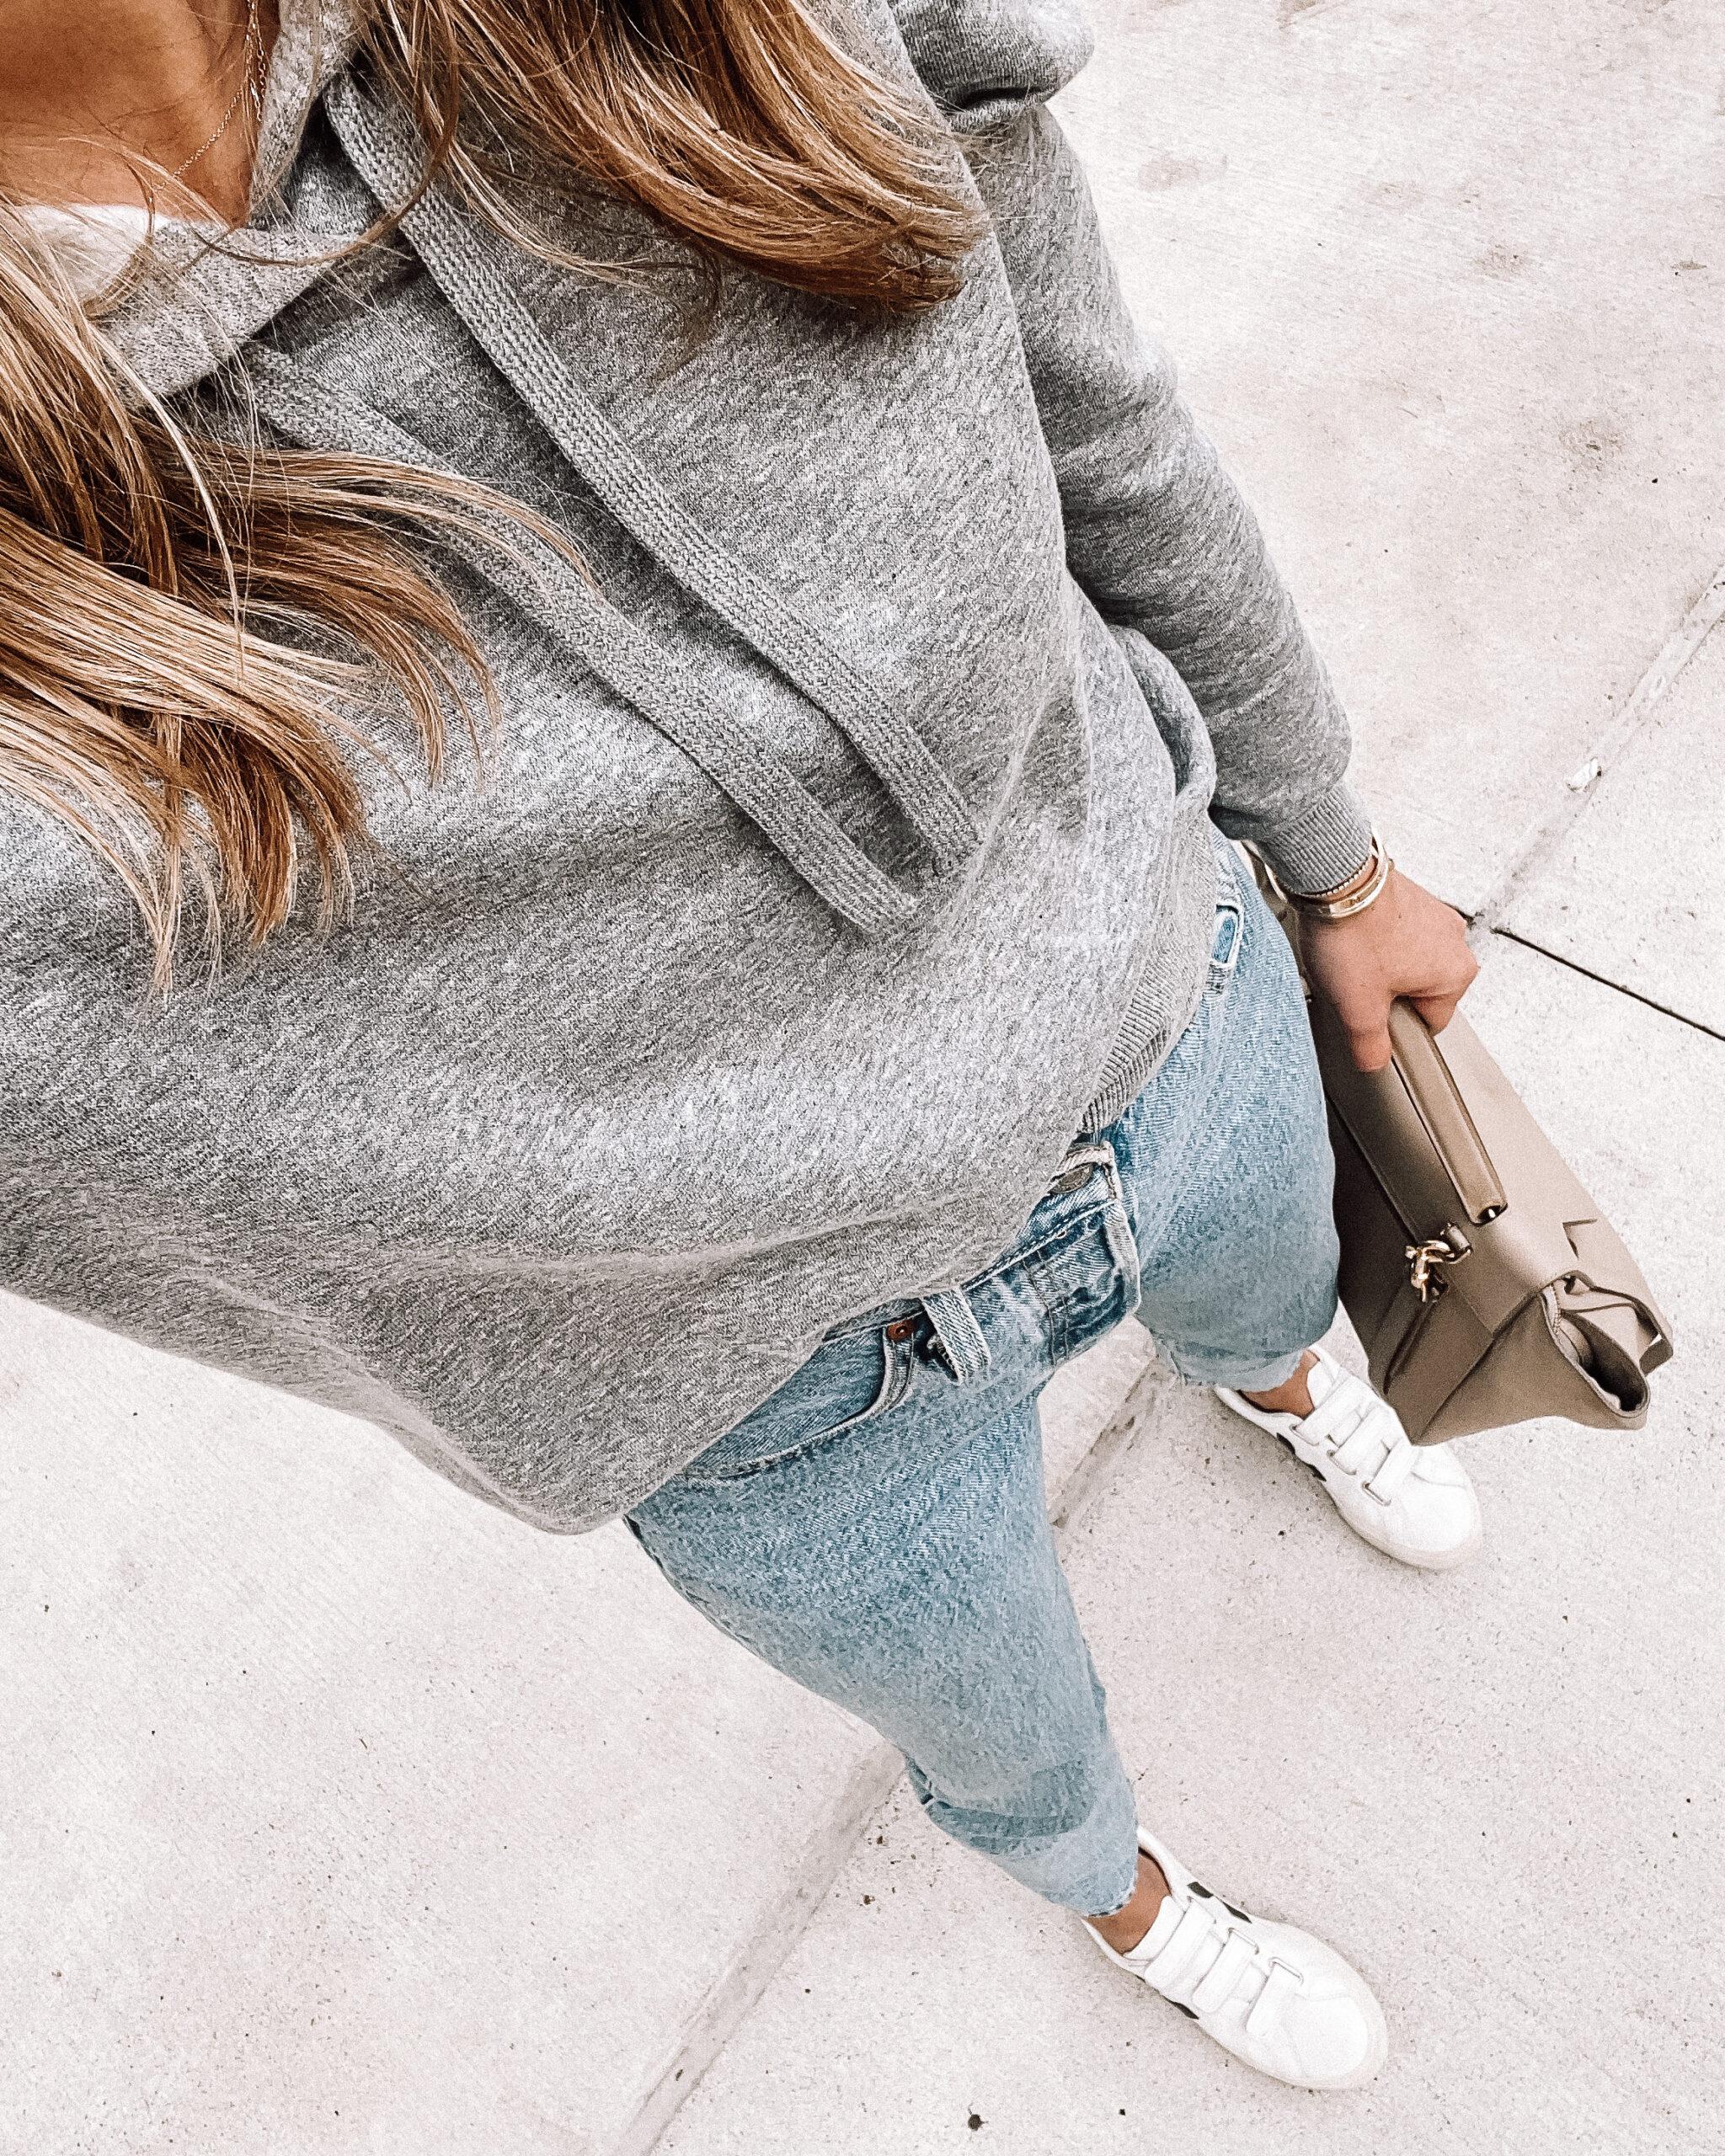 Fashion Jackson Wearing Grey Puff Sleeve Sweatshirt Levis Jeans Veja Velcro Sneakers